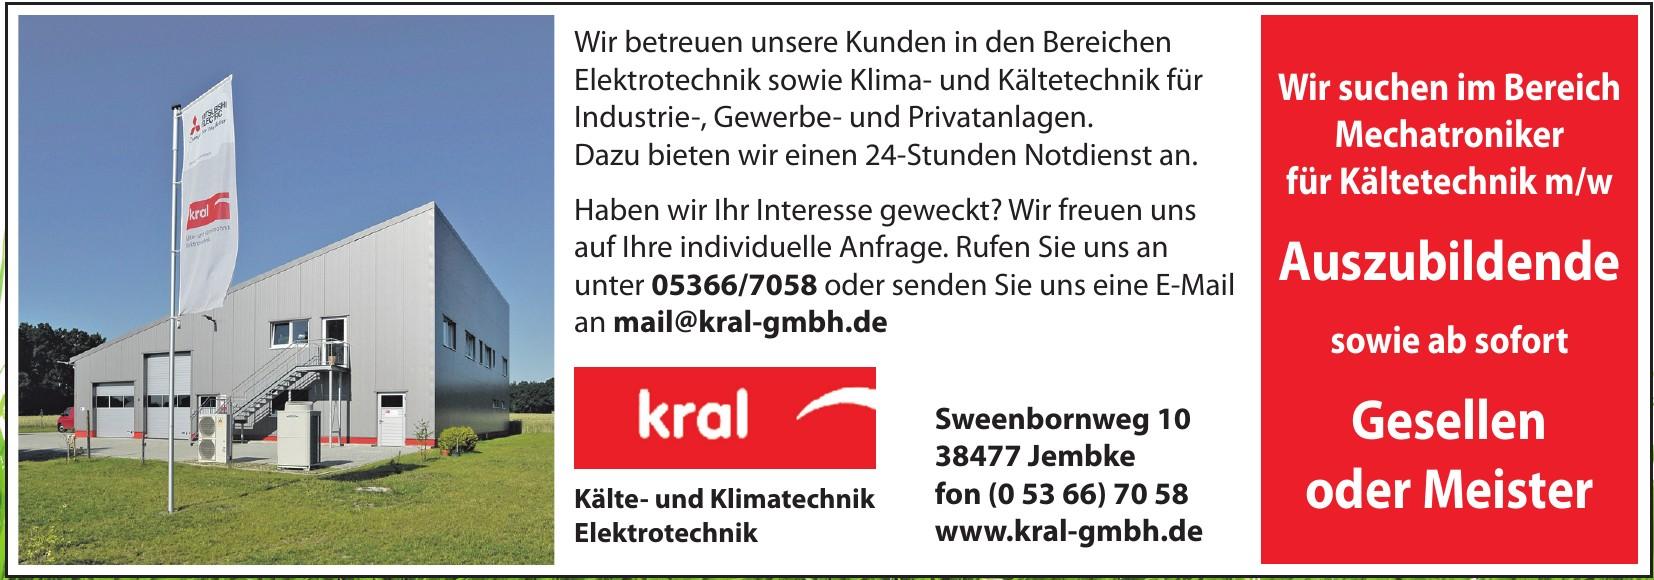 Kral Kälte- und Klimatechnik, Elektrotechnik